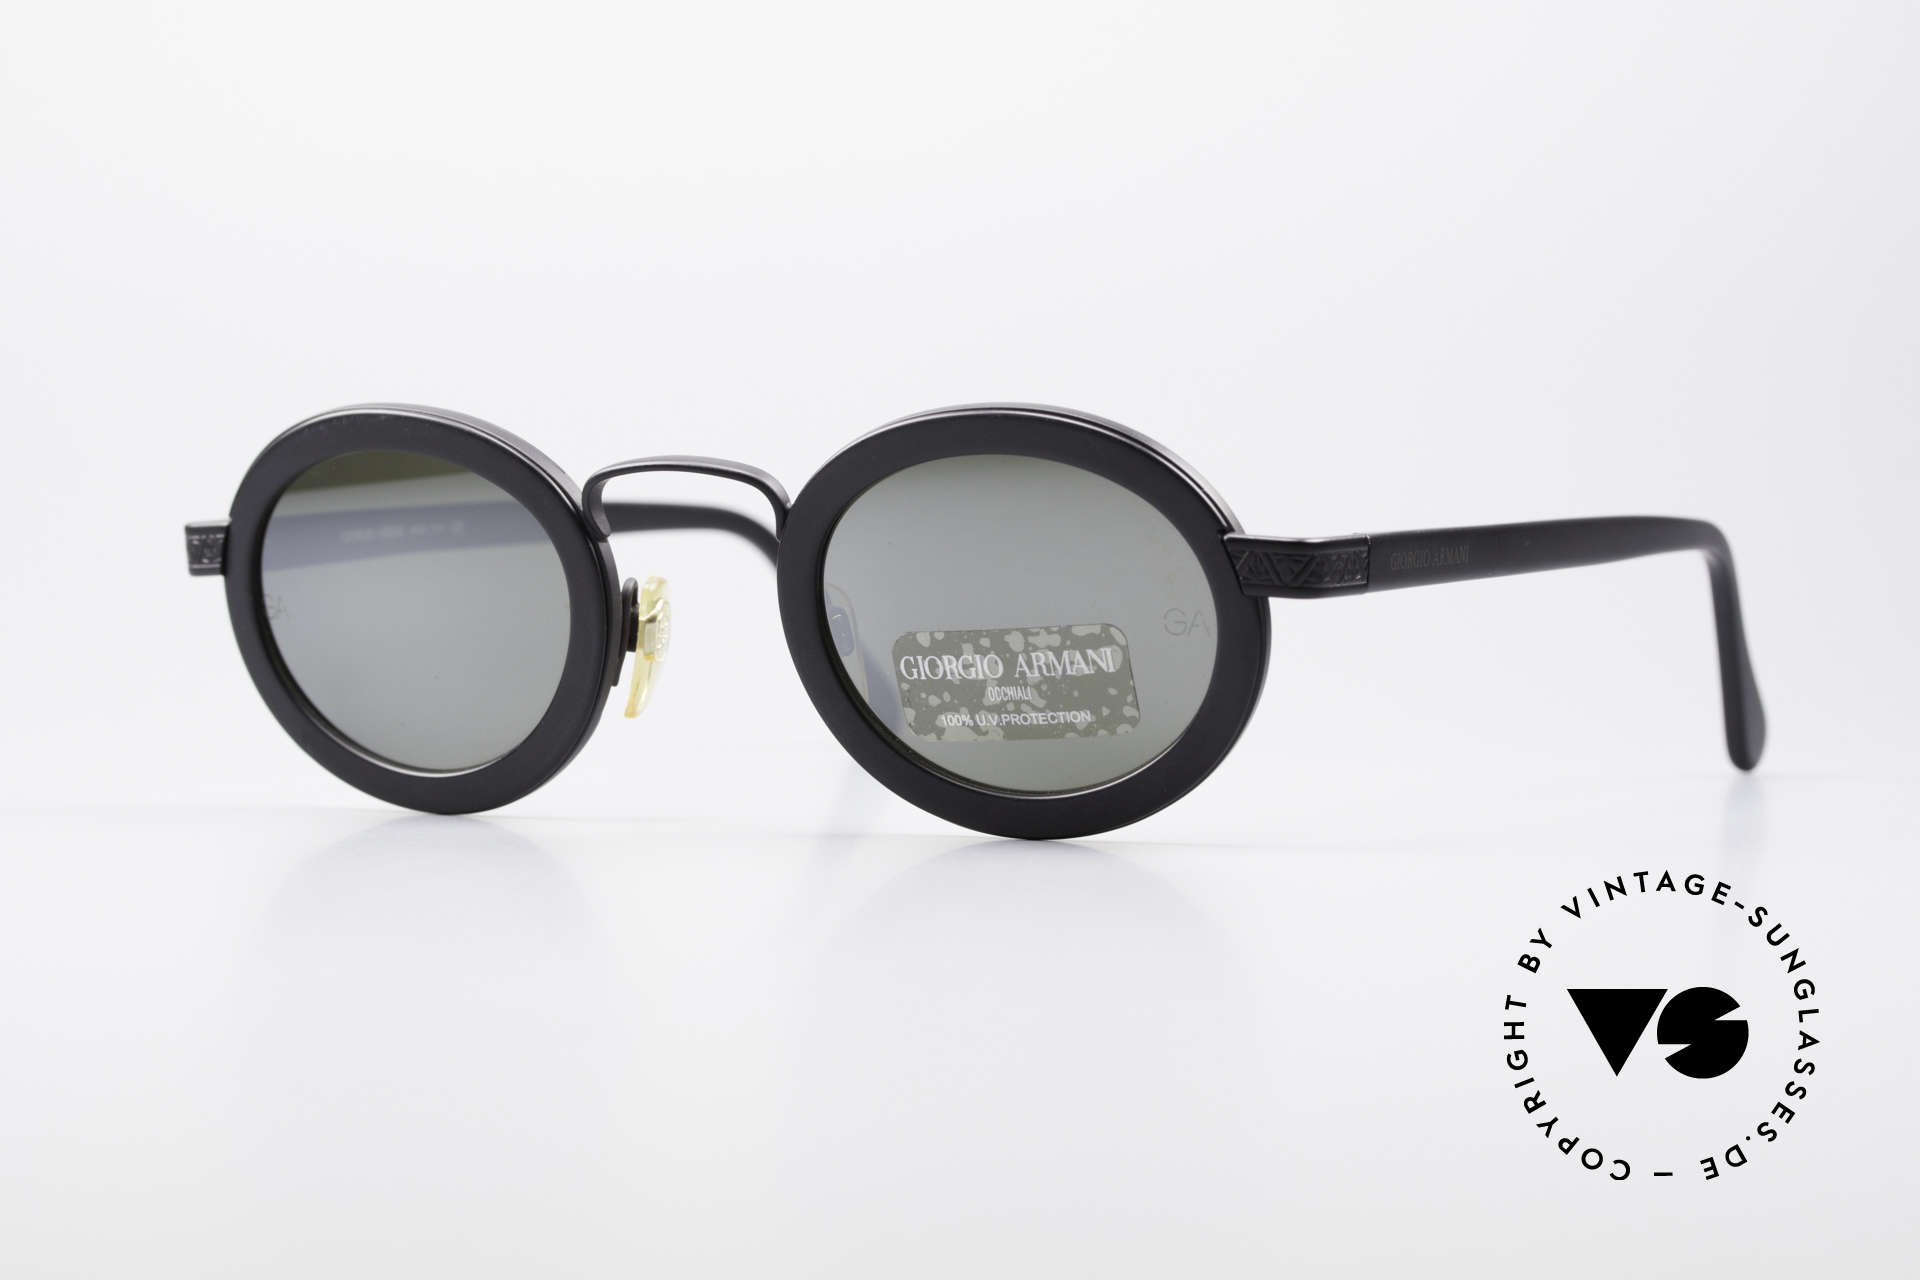 0caa0f77c19 Sunglasses Giorgio Armani 631 Oval 90s Sunglasses Mirrored